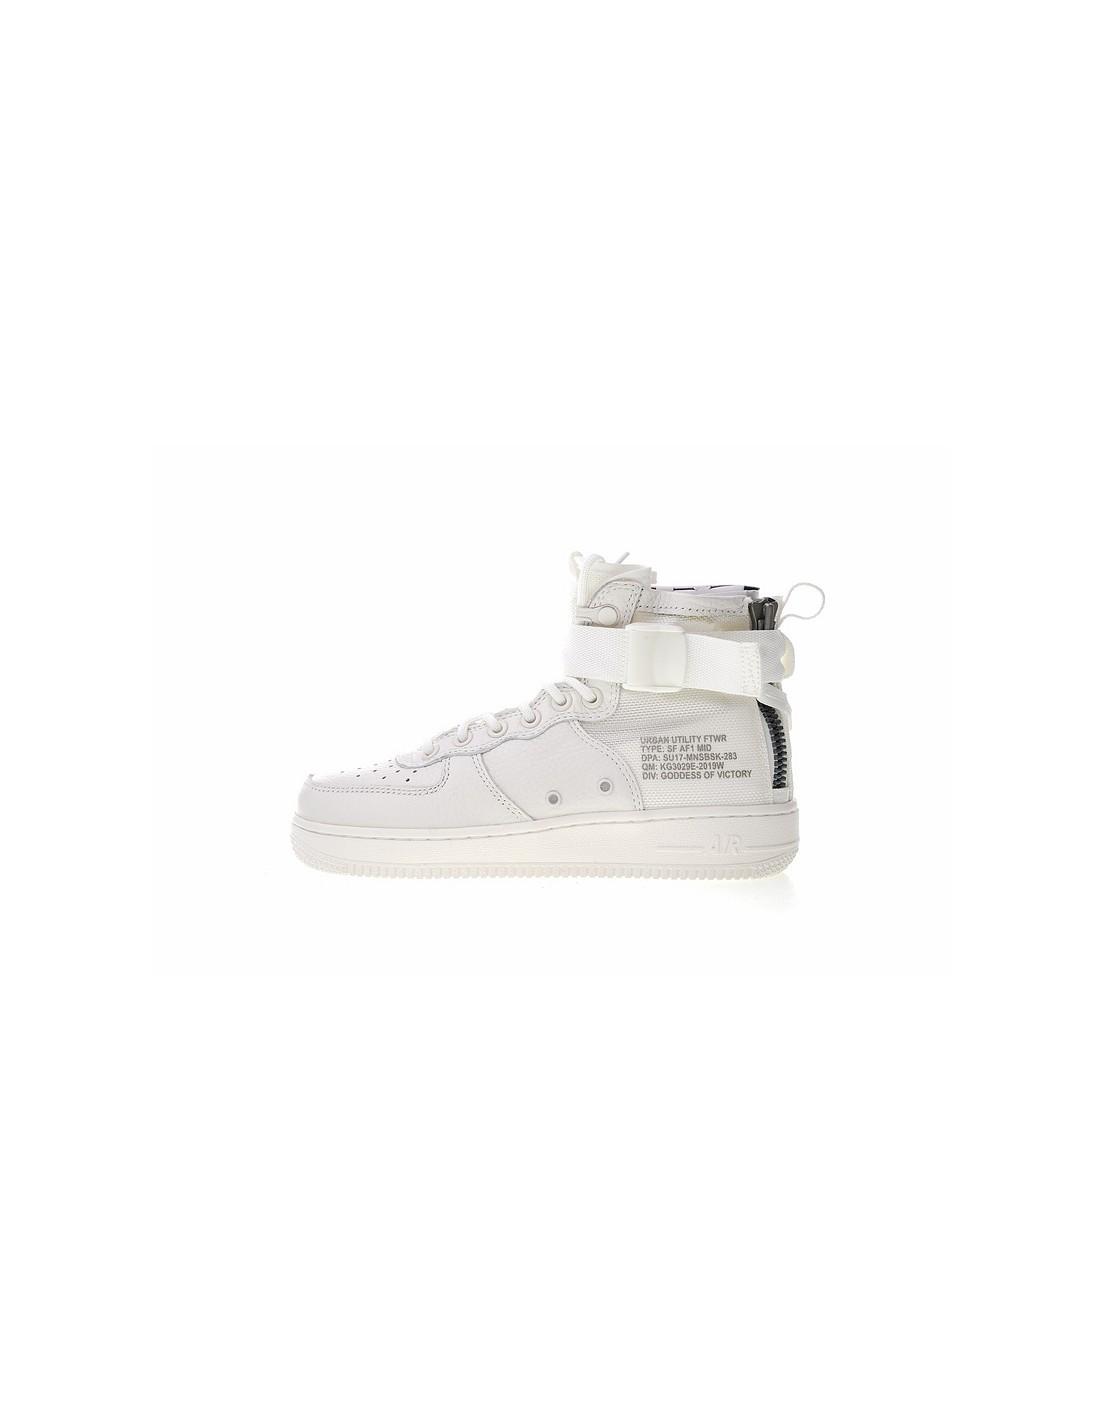 027979f629d11 Nike SF Air Force 1 Mid Men's & Women's Shoe